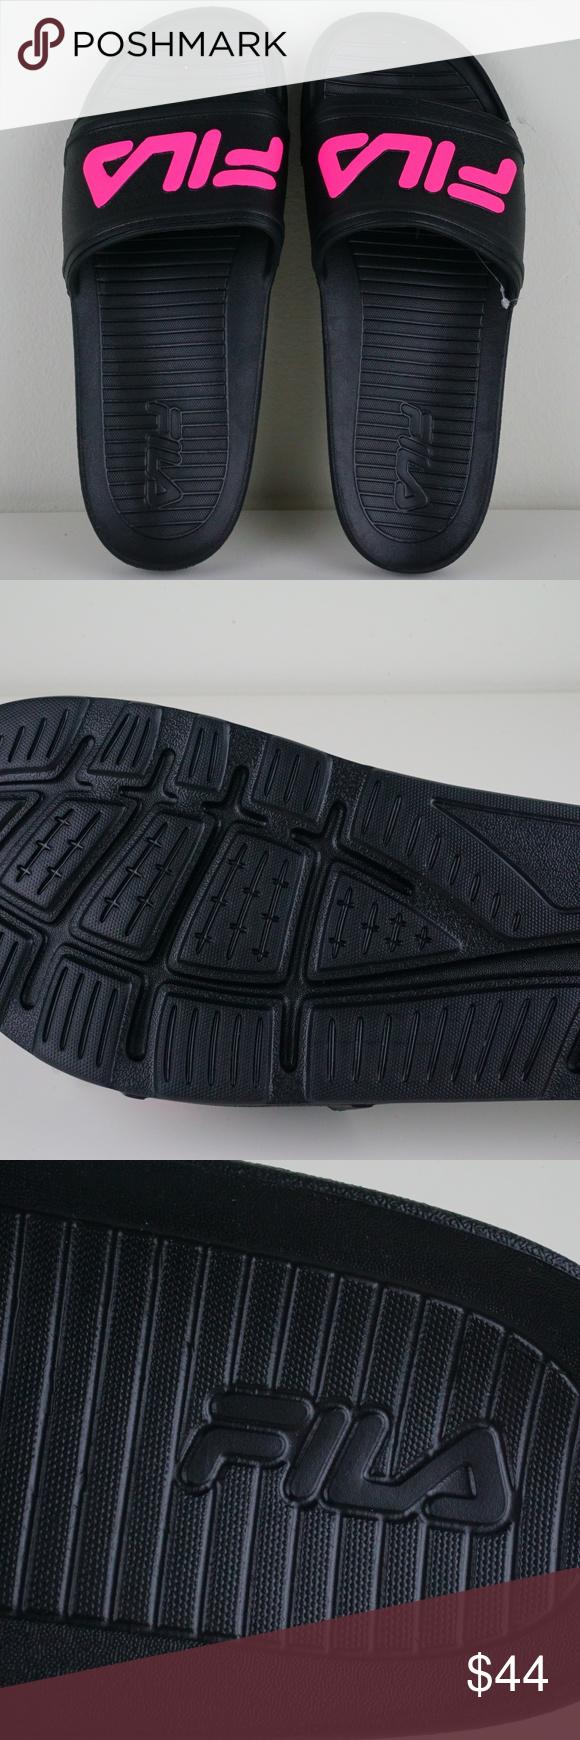 86bff41c3c47 Size 10 · Athletic · Fila Sleek Slide LT Mens Sandals Flip Flops Brand New